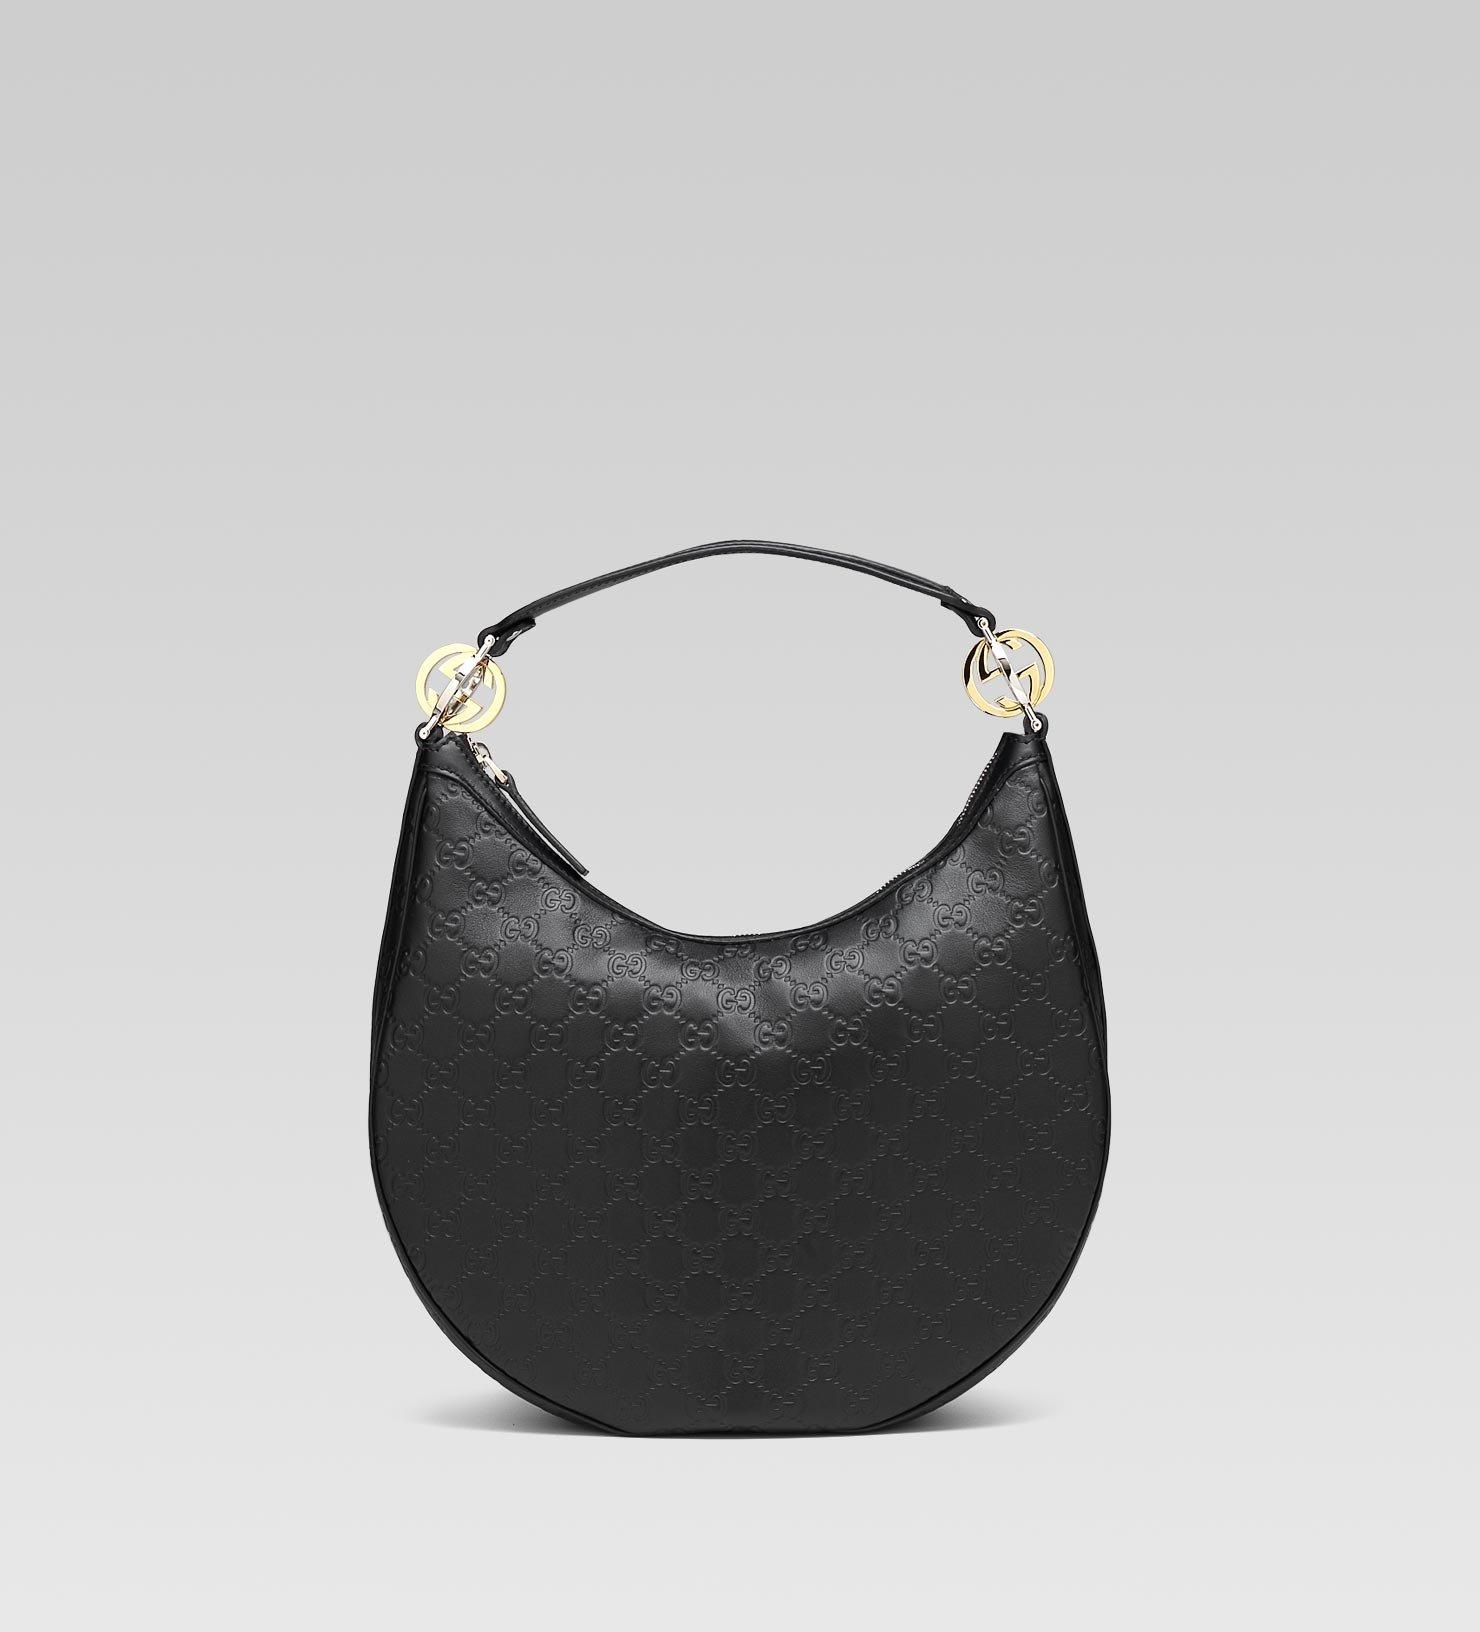 621655420a77 Gucci Gg Twins Medium Hobo with Interlocking G Details in Black - Lyst